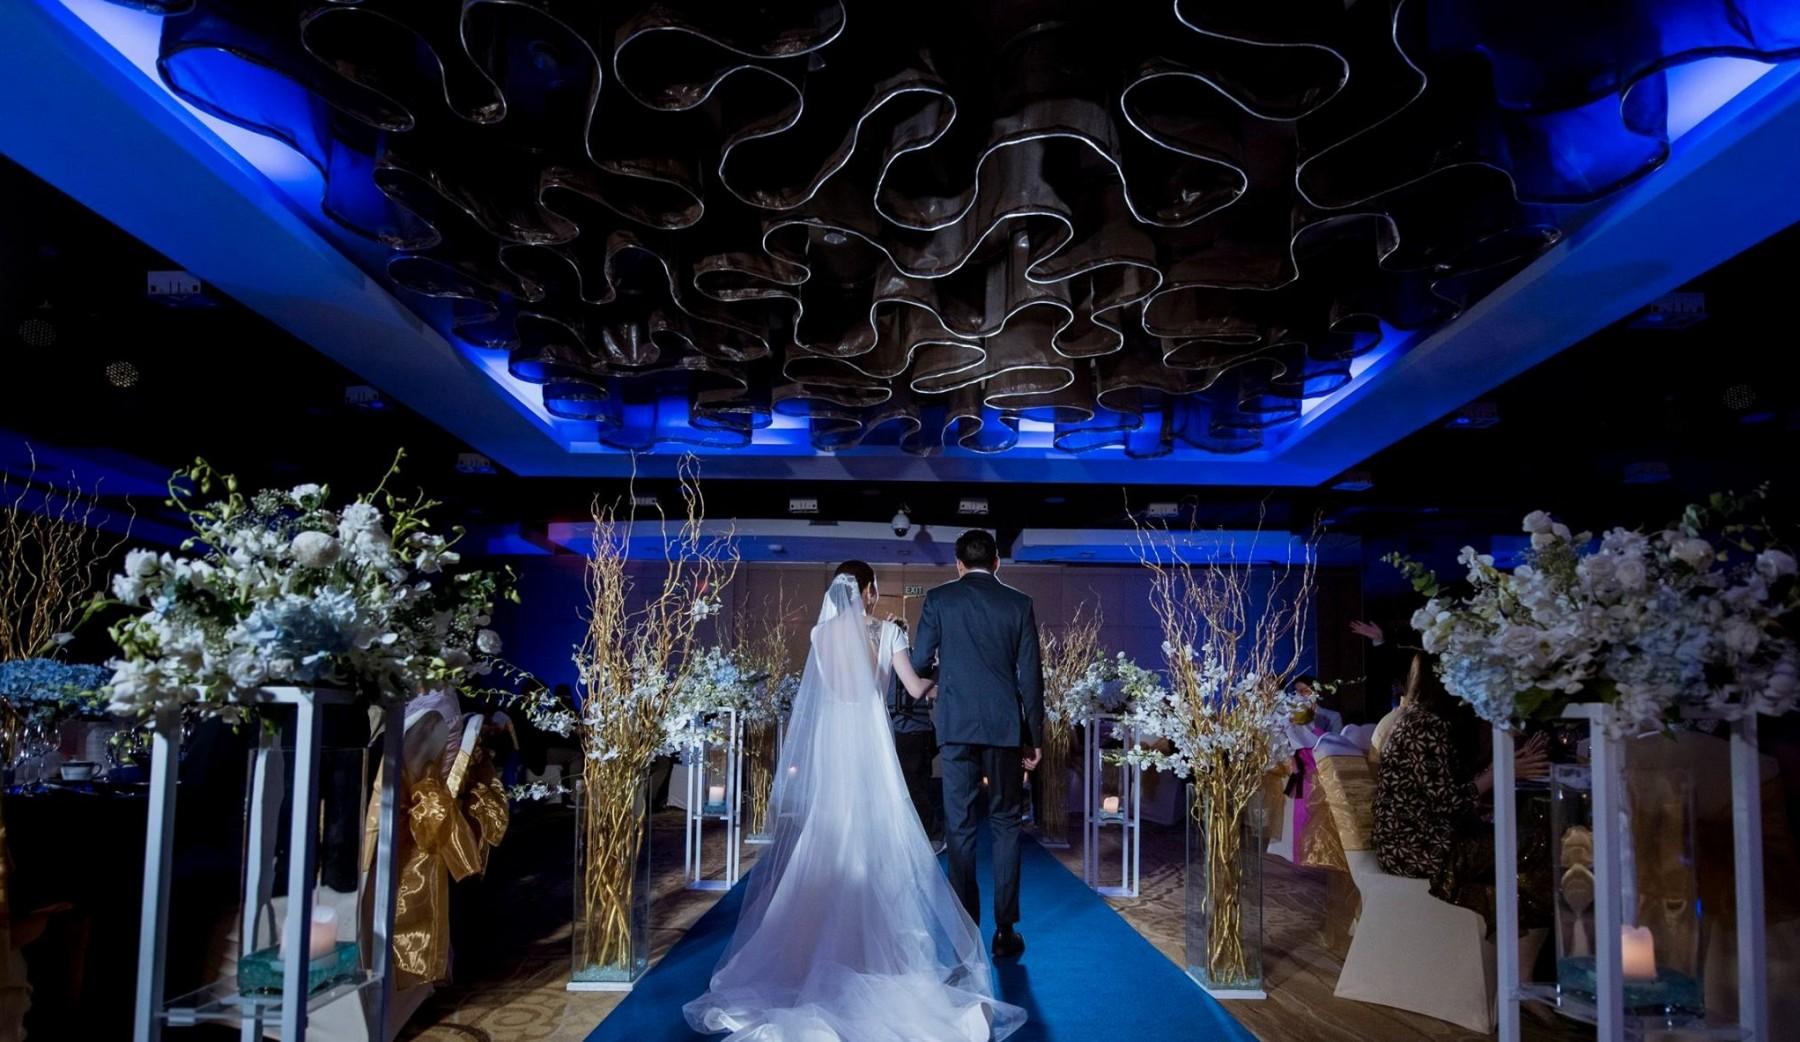 fulfill-all-your-wedding-dream